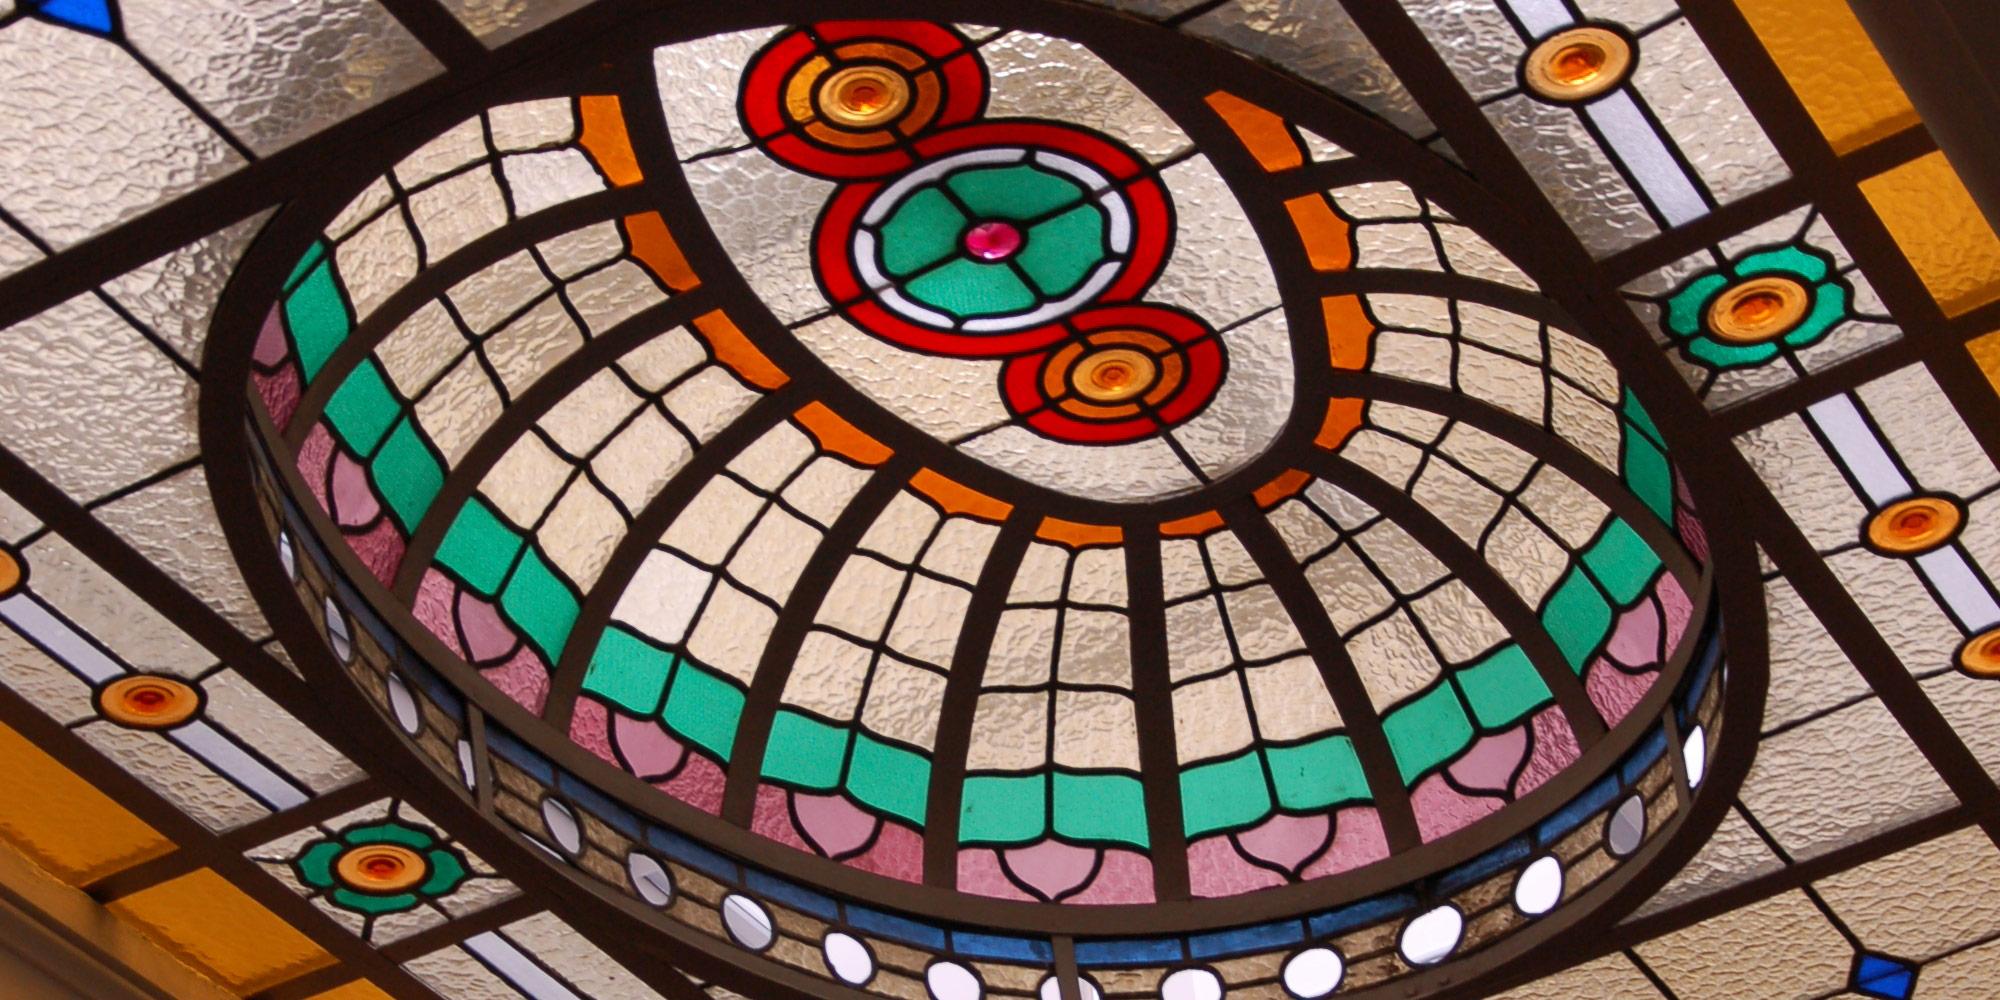 Magnolia-Hotel-Boutique-Palermo-Buenos-Aires-design-by-Guapo-53